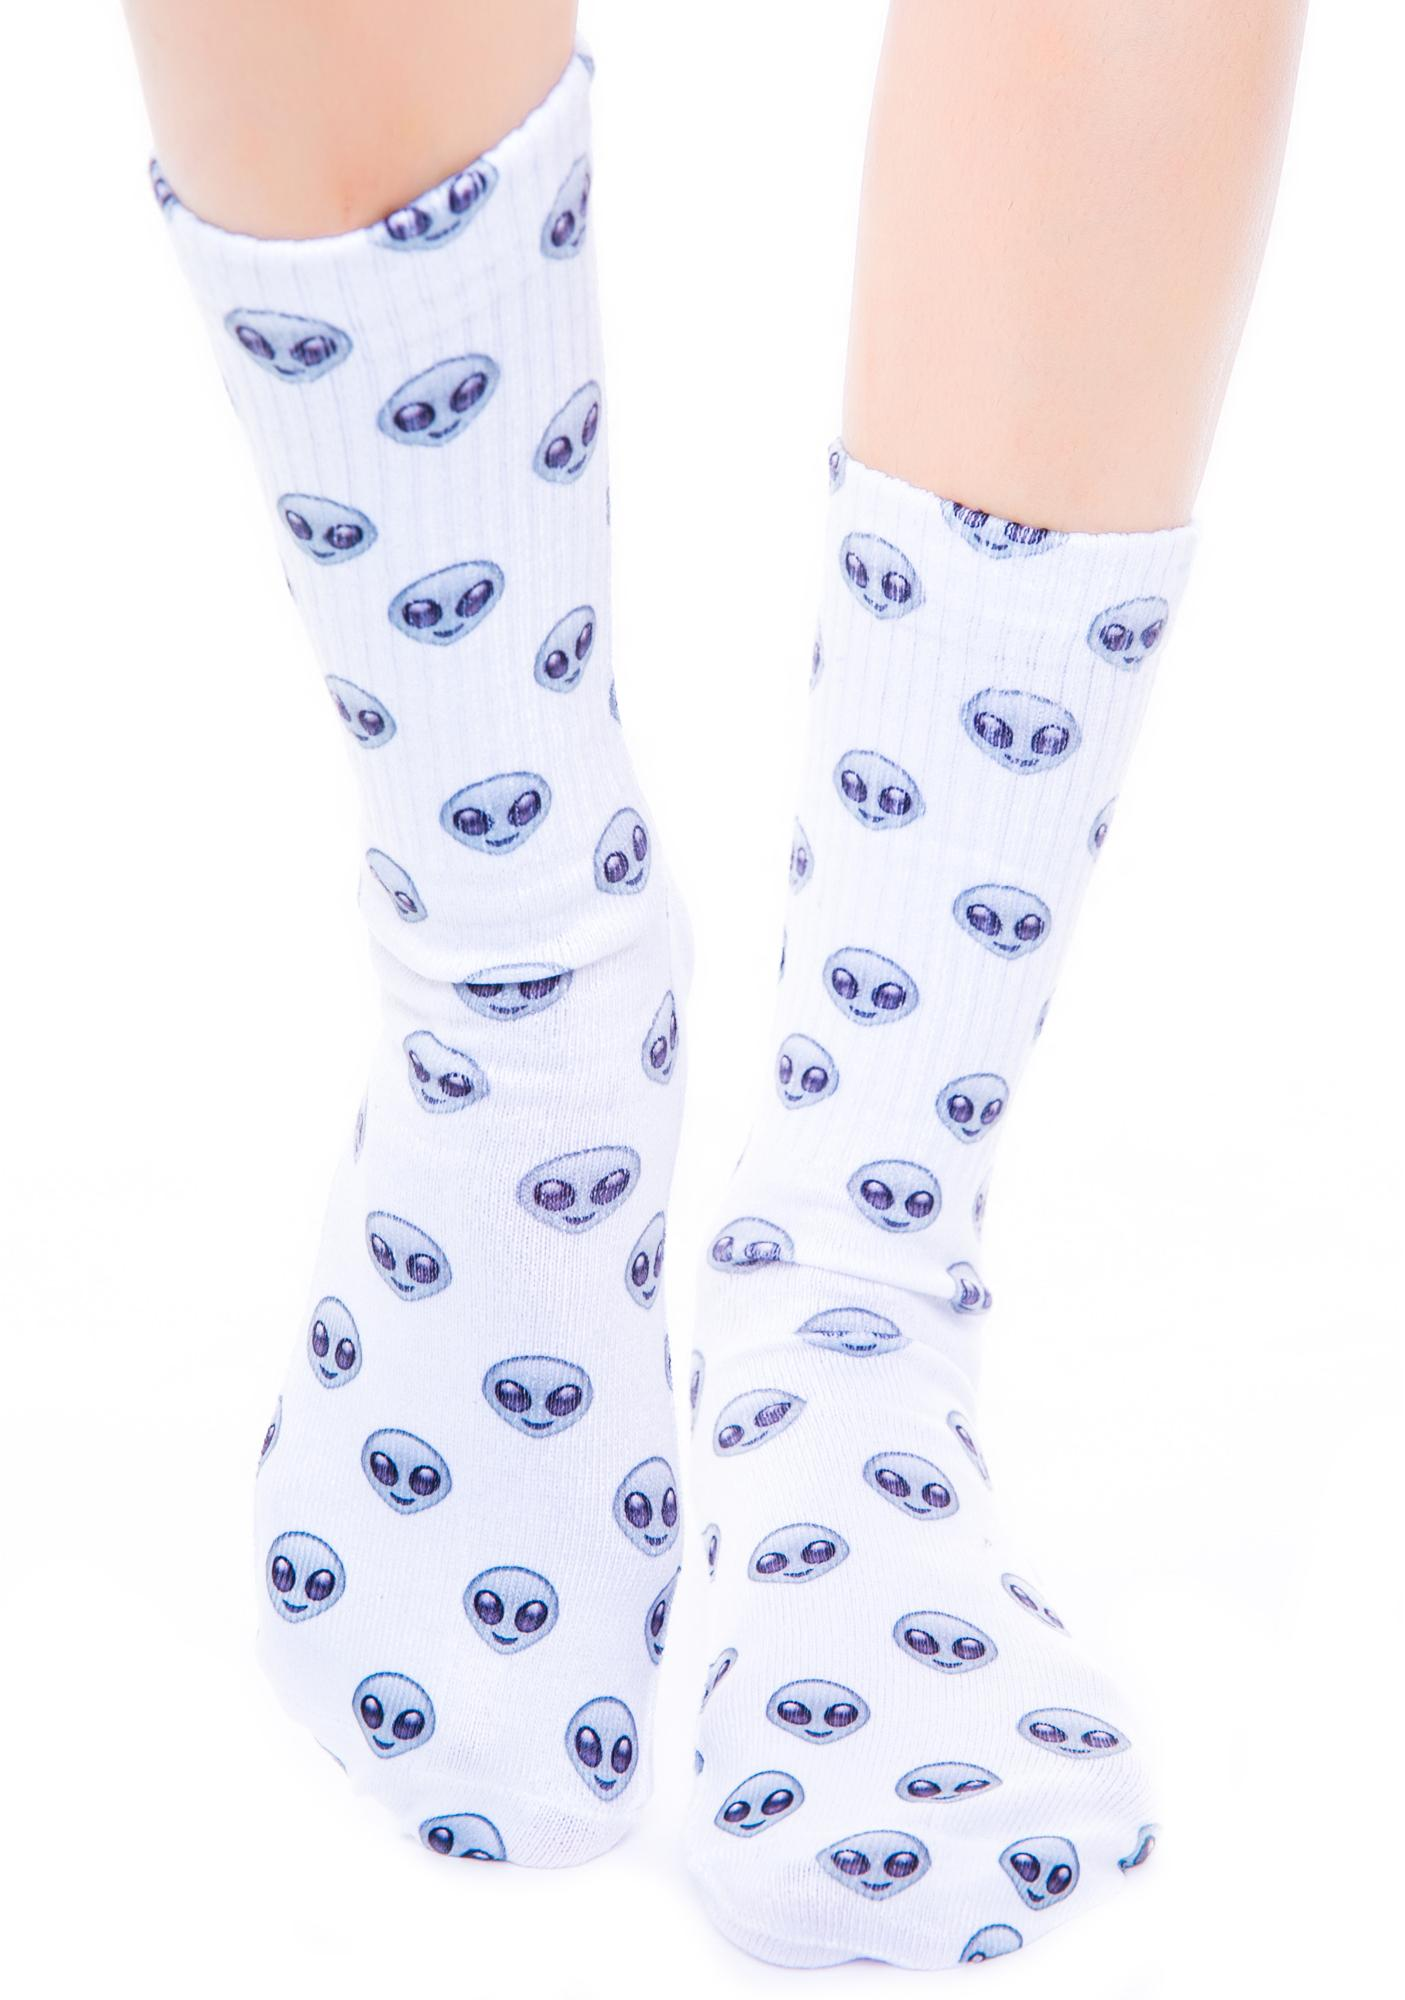 O Mighty Alien Emoji Socks